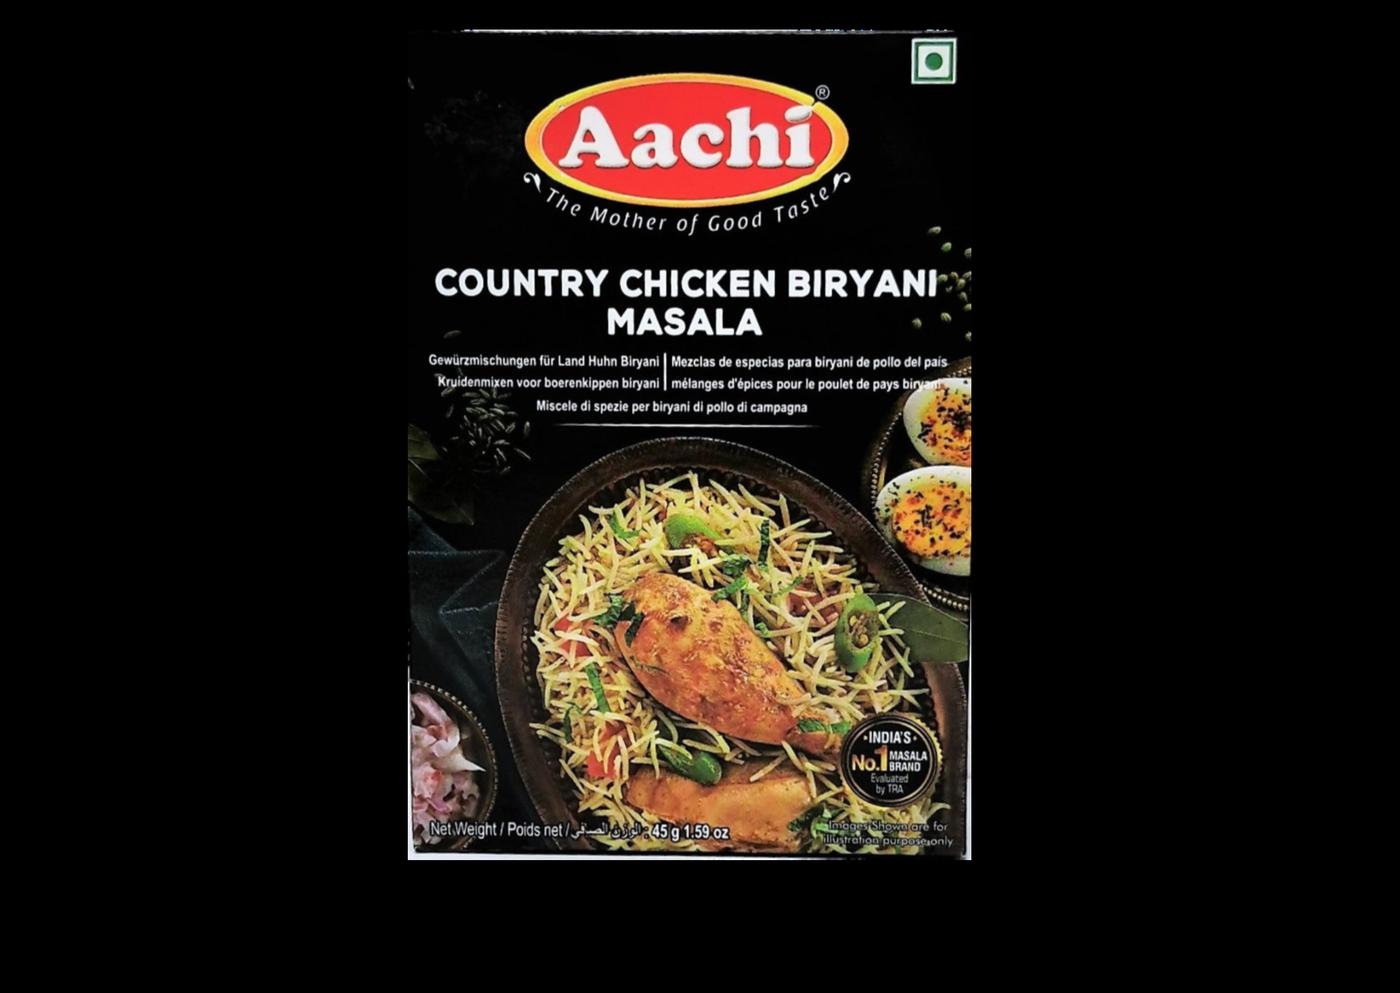 Aachi Country Chicken Biryani Masala